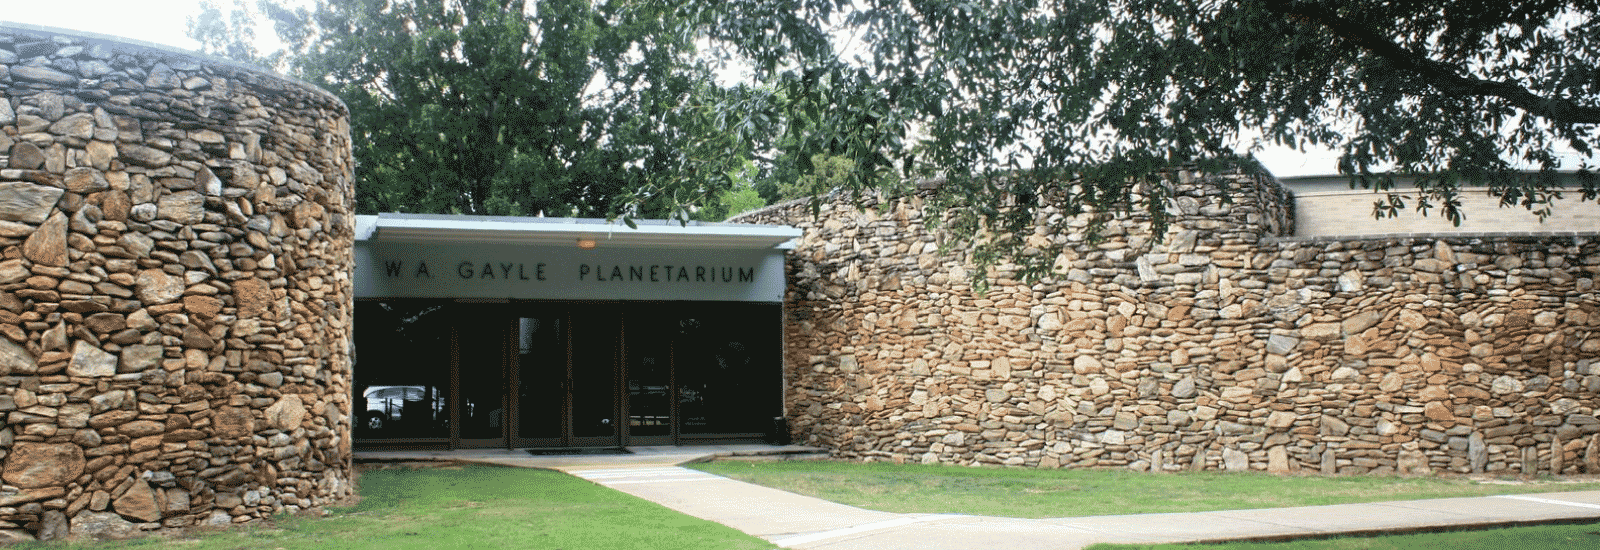 W.A. Gayle Planetarium, Montgomery, AL